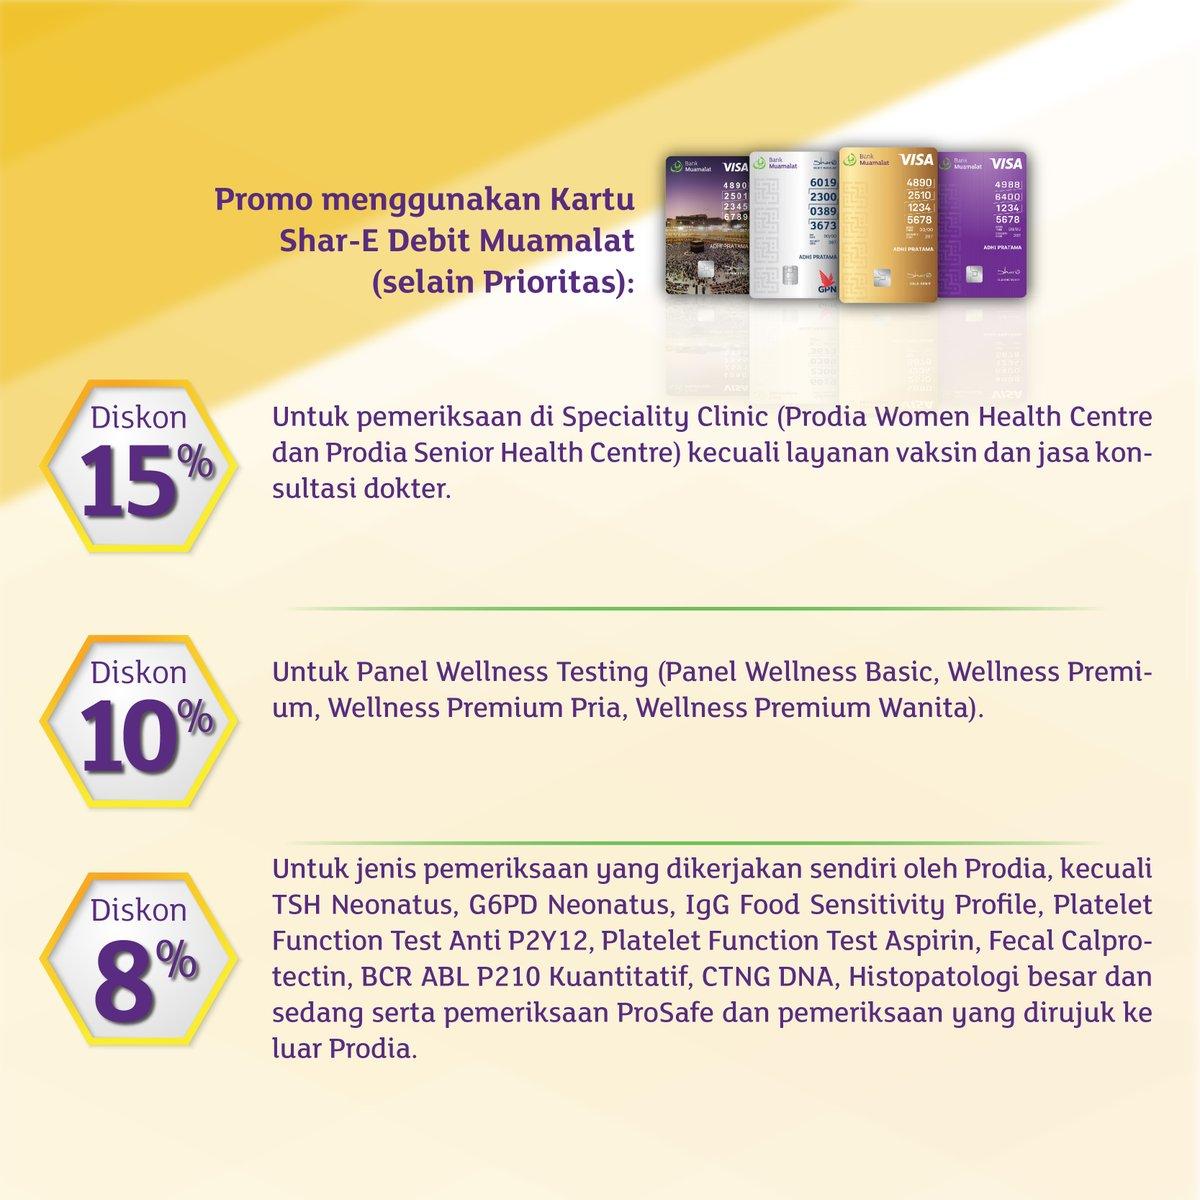 Bank Muamalat - Promo Diskon Mulai 8% Medical Check Up & Laboratorium di Prodia